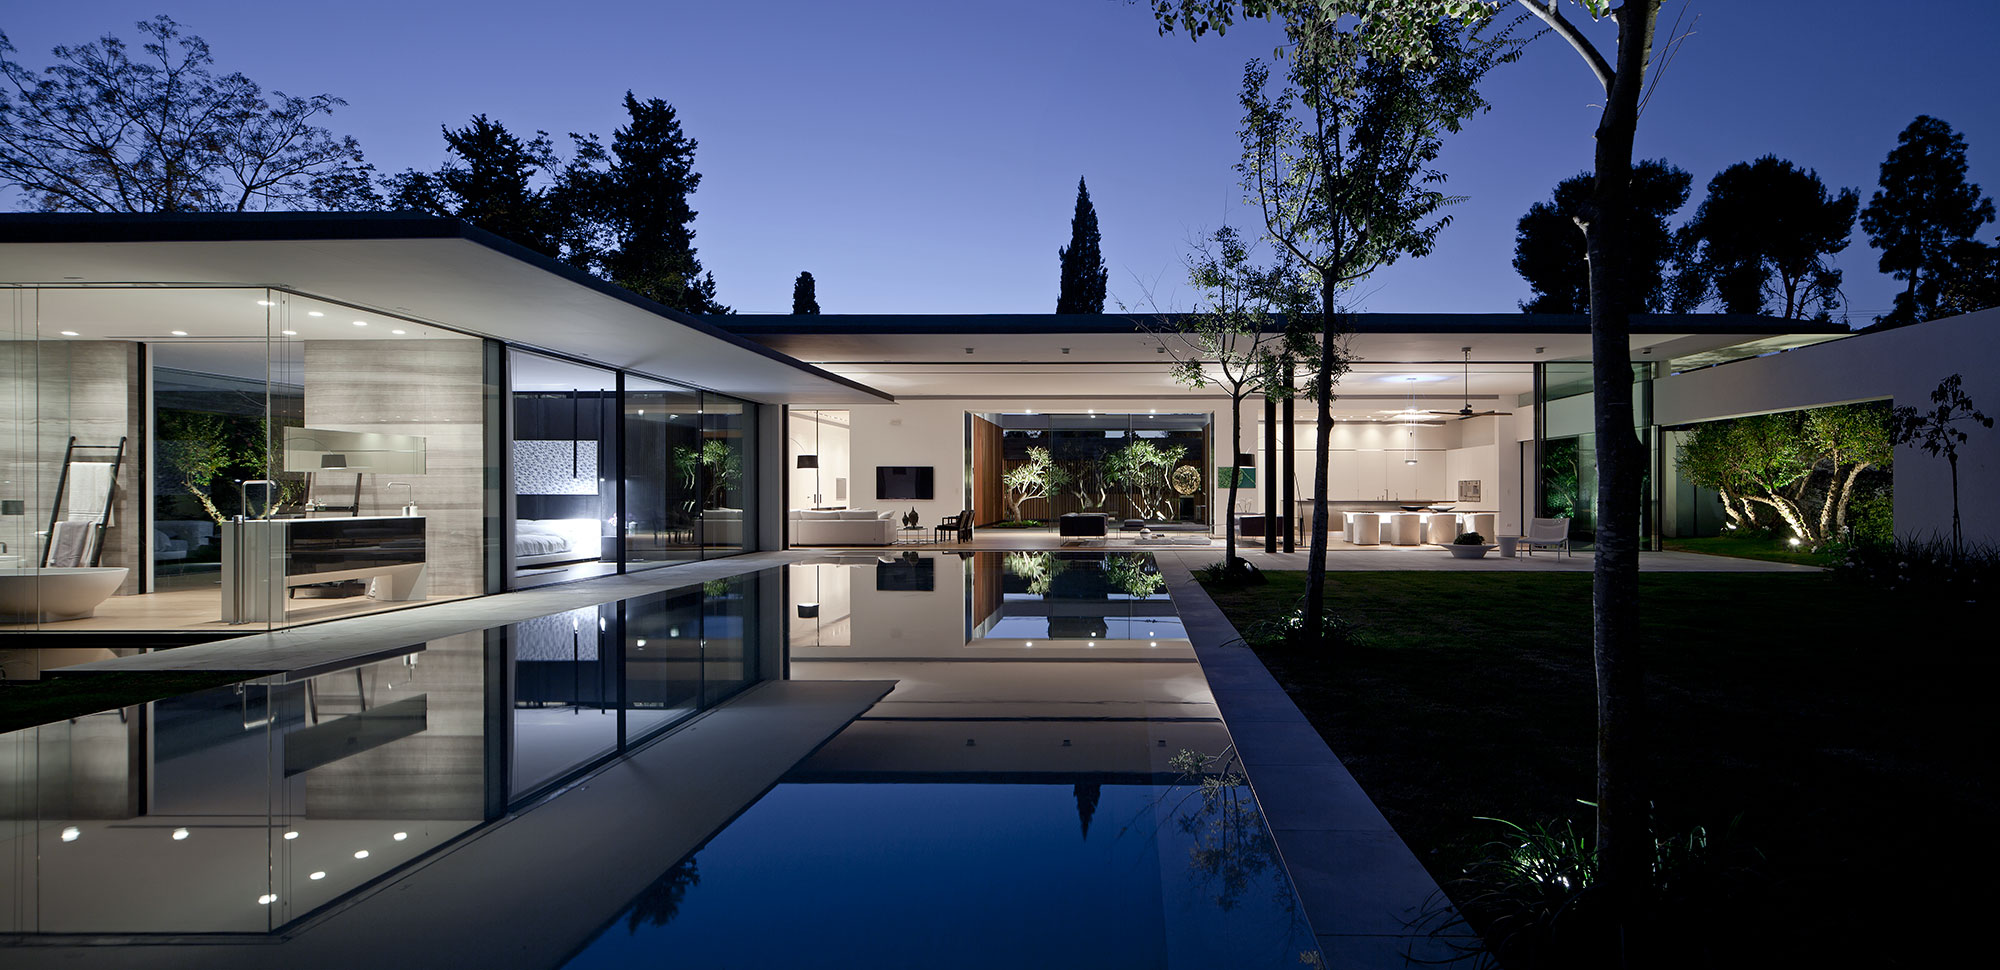 Design: Pitsou Kedem Architects, Tel Aviv (Israel)